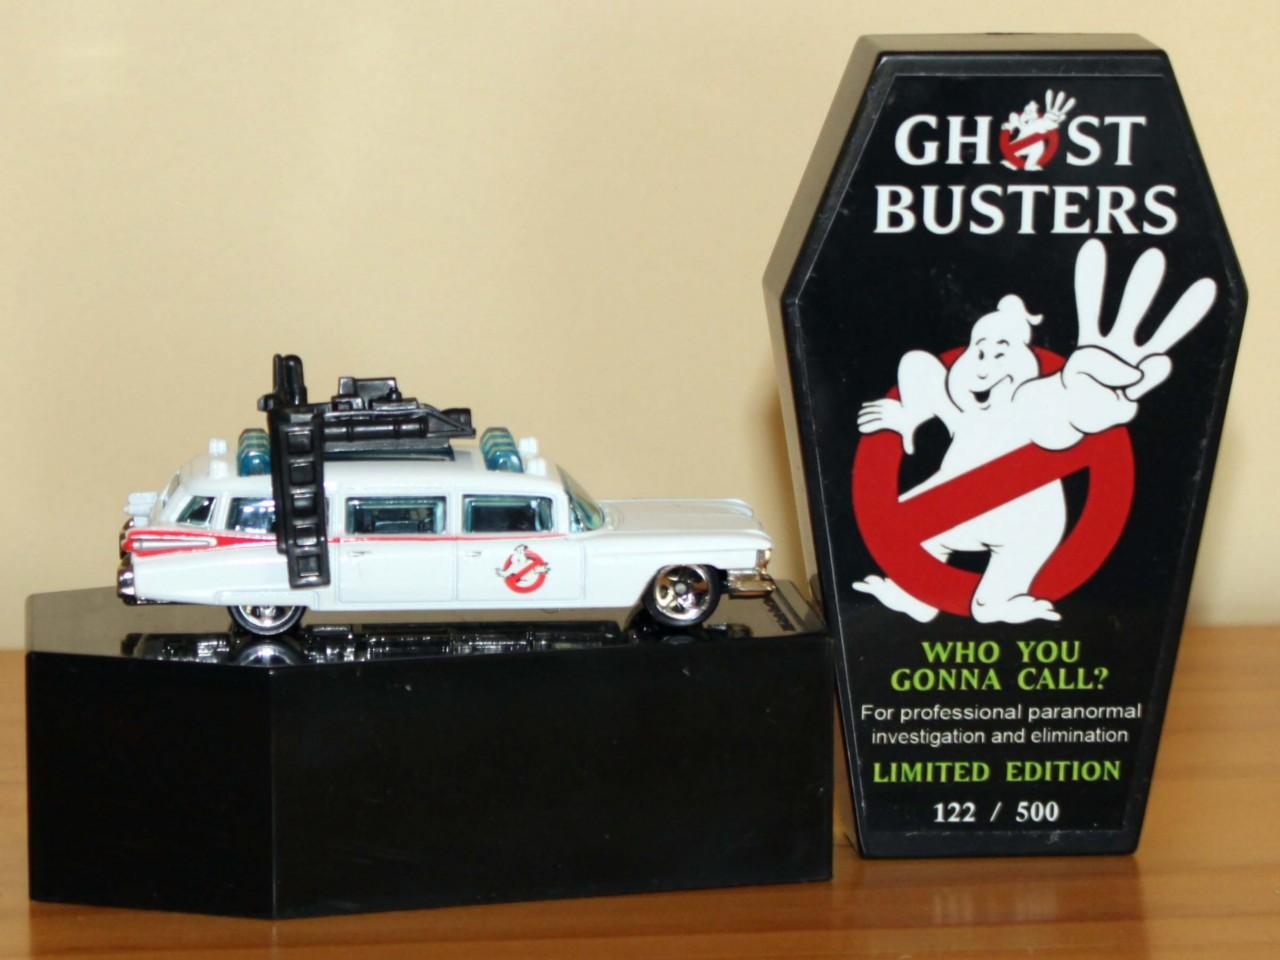 ECTO-1 Dans un Coffin case, Ghostbusters 3??? 411817485_o